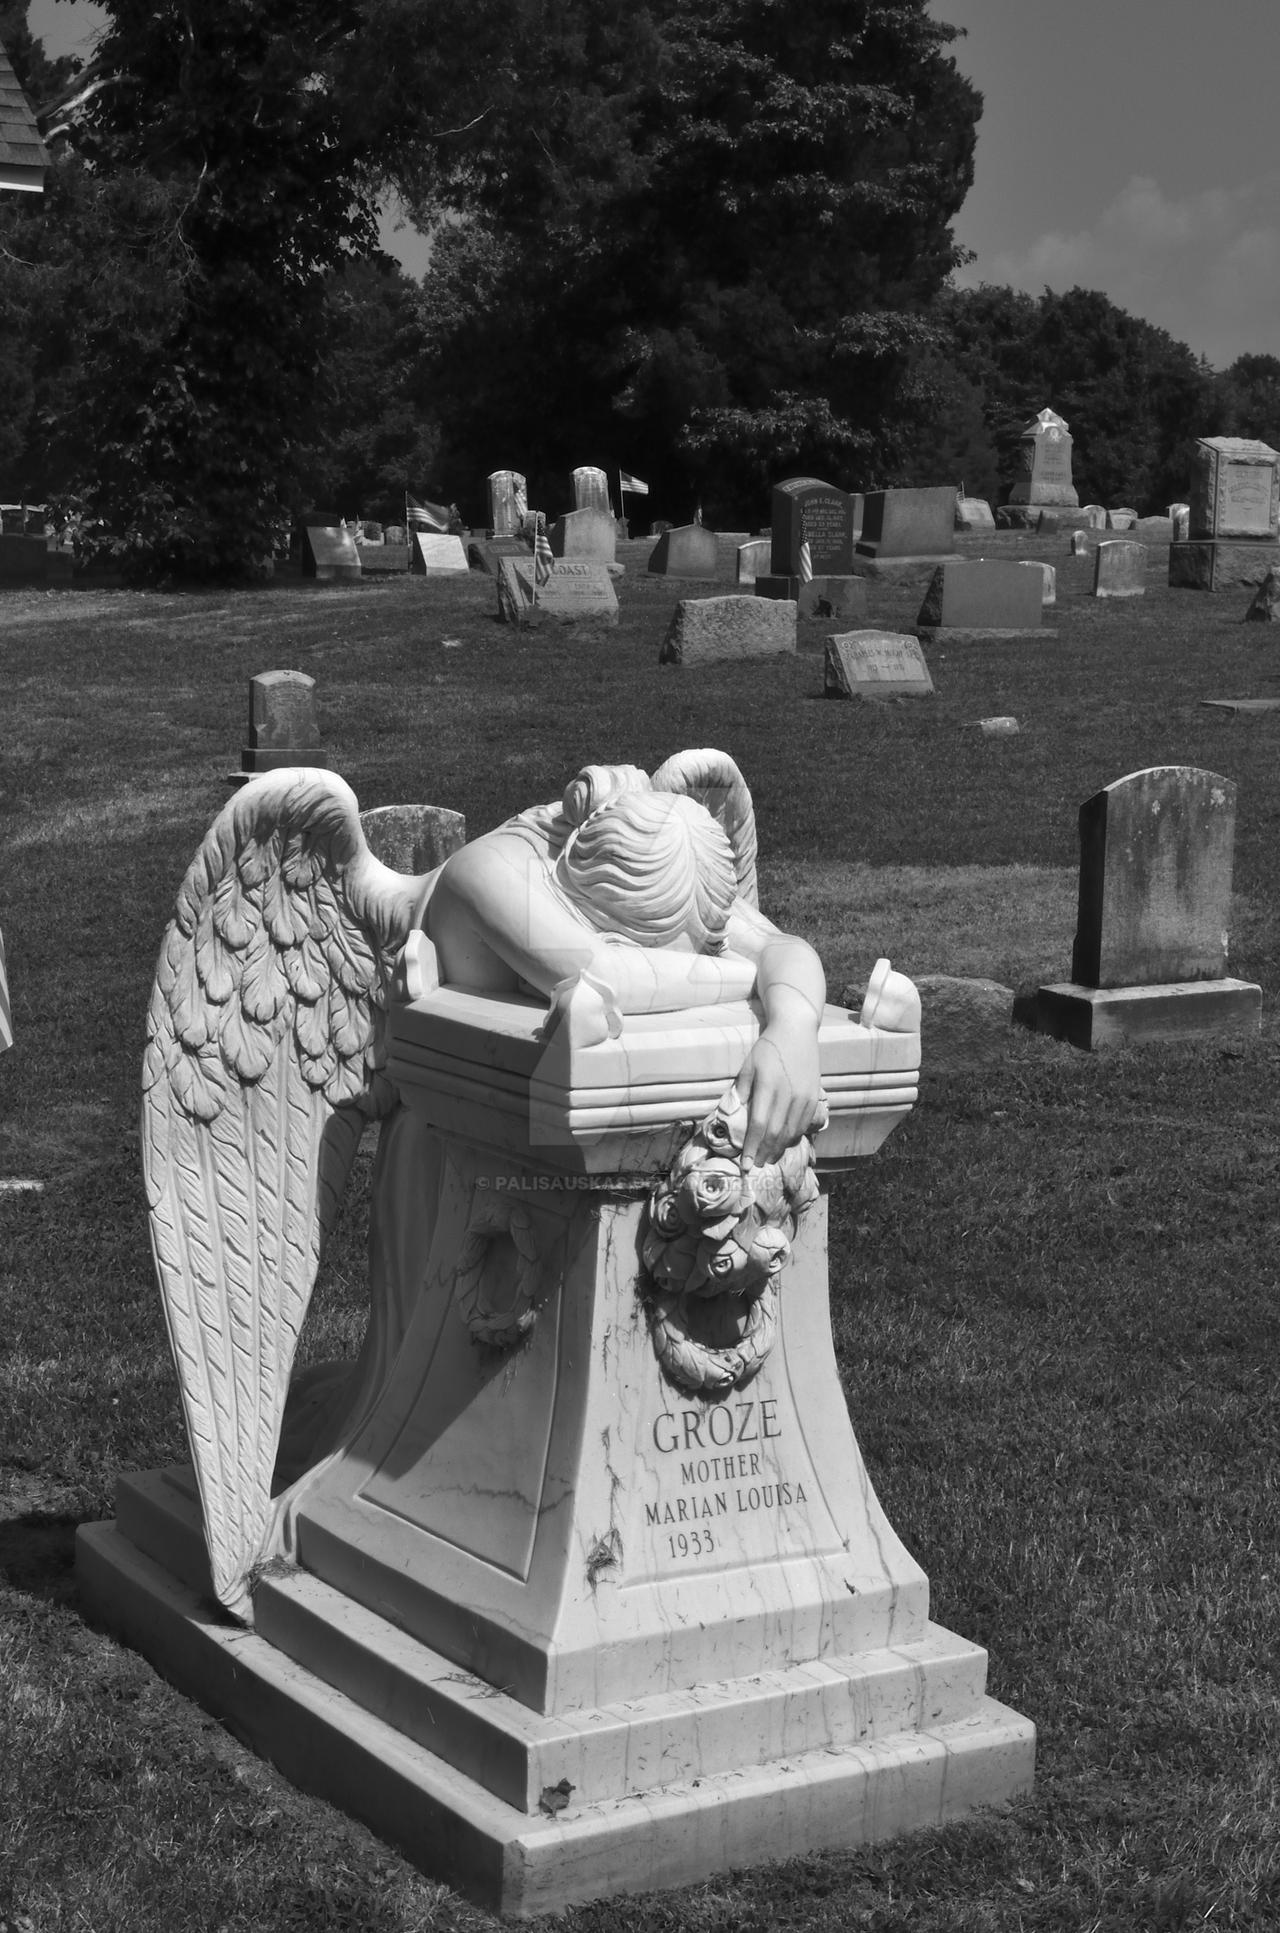 weeping angel statue by palisauskas on deviantart